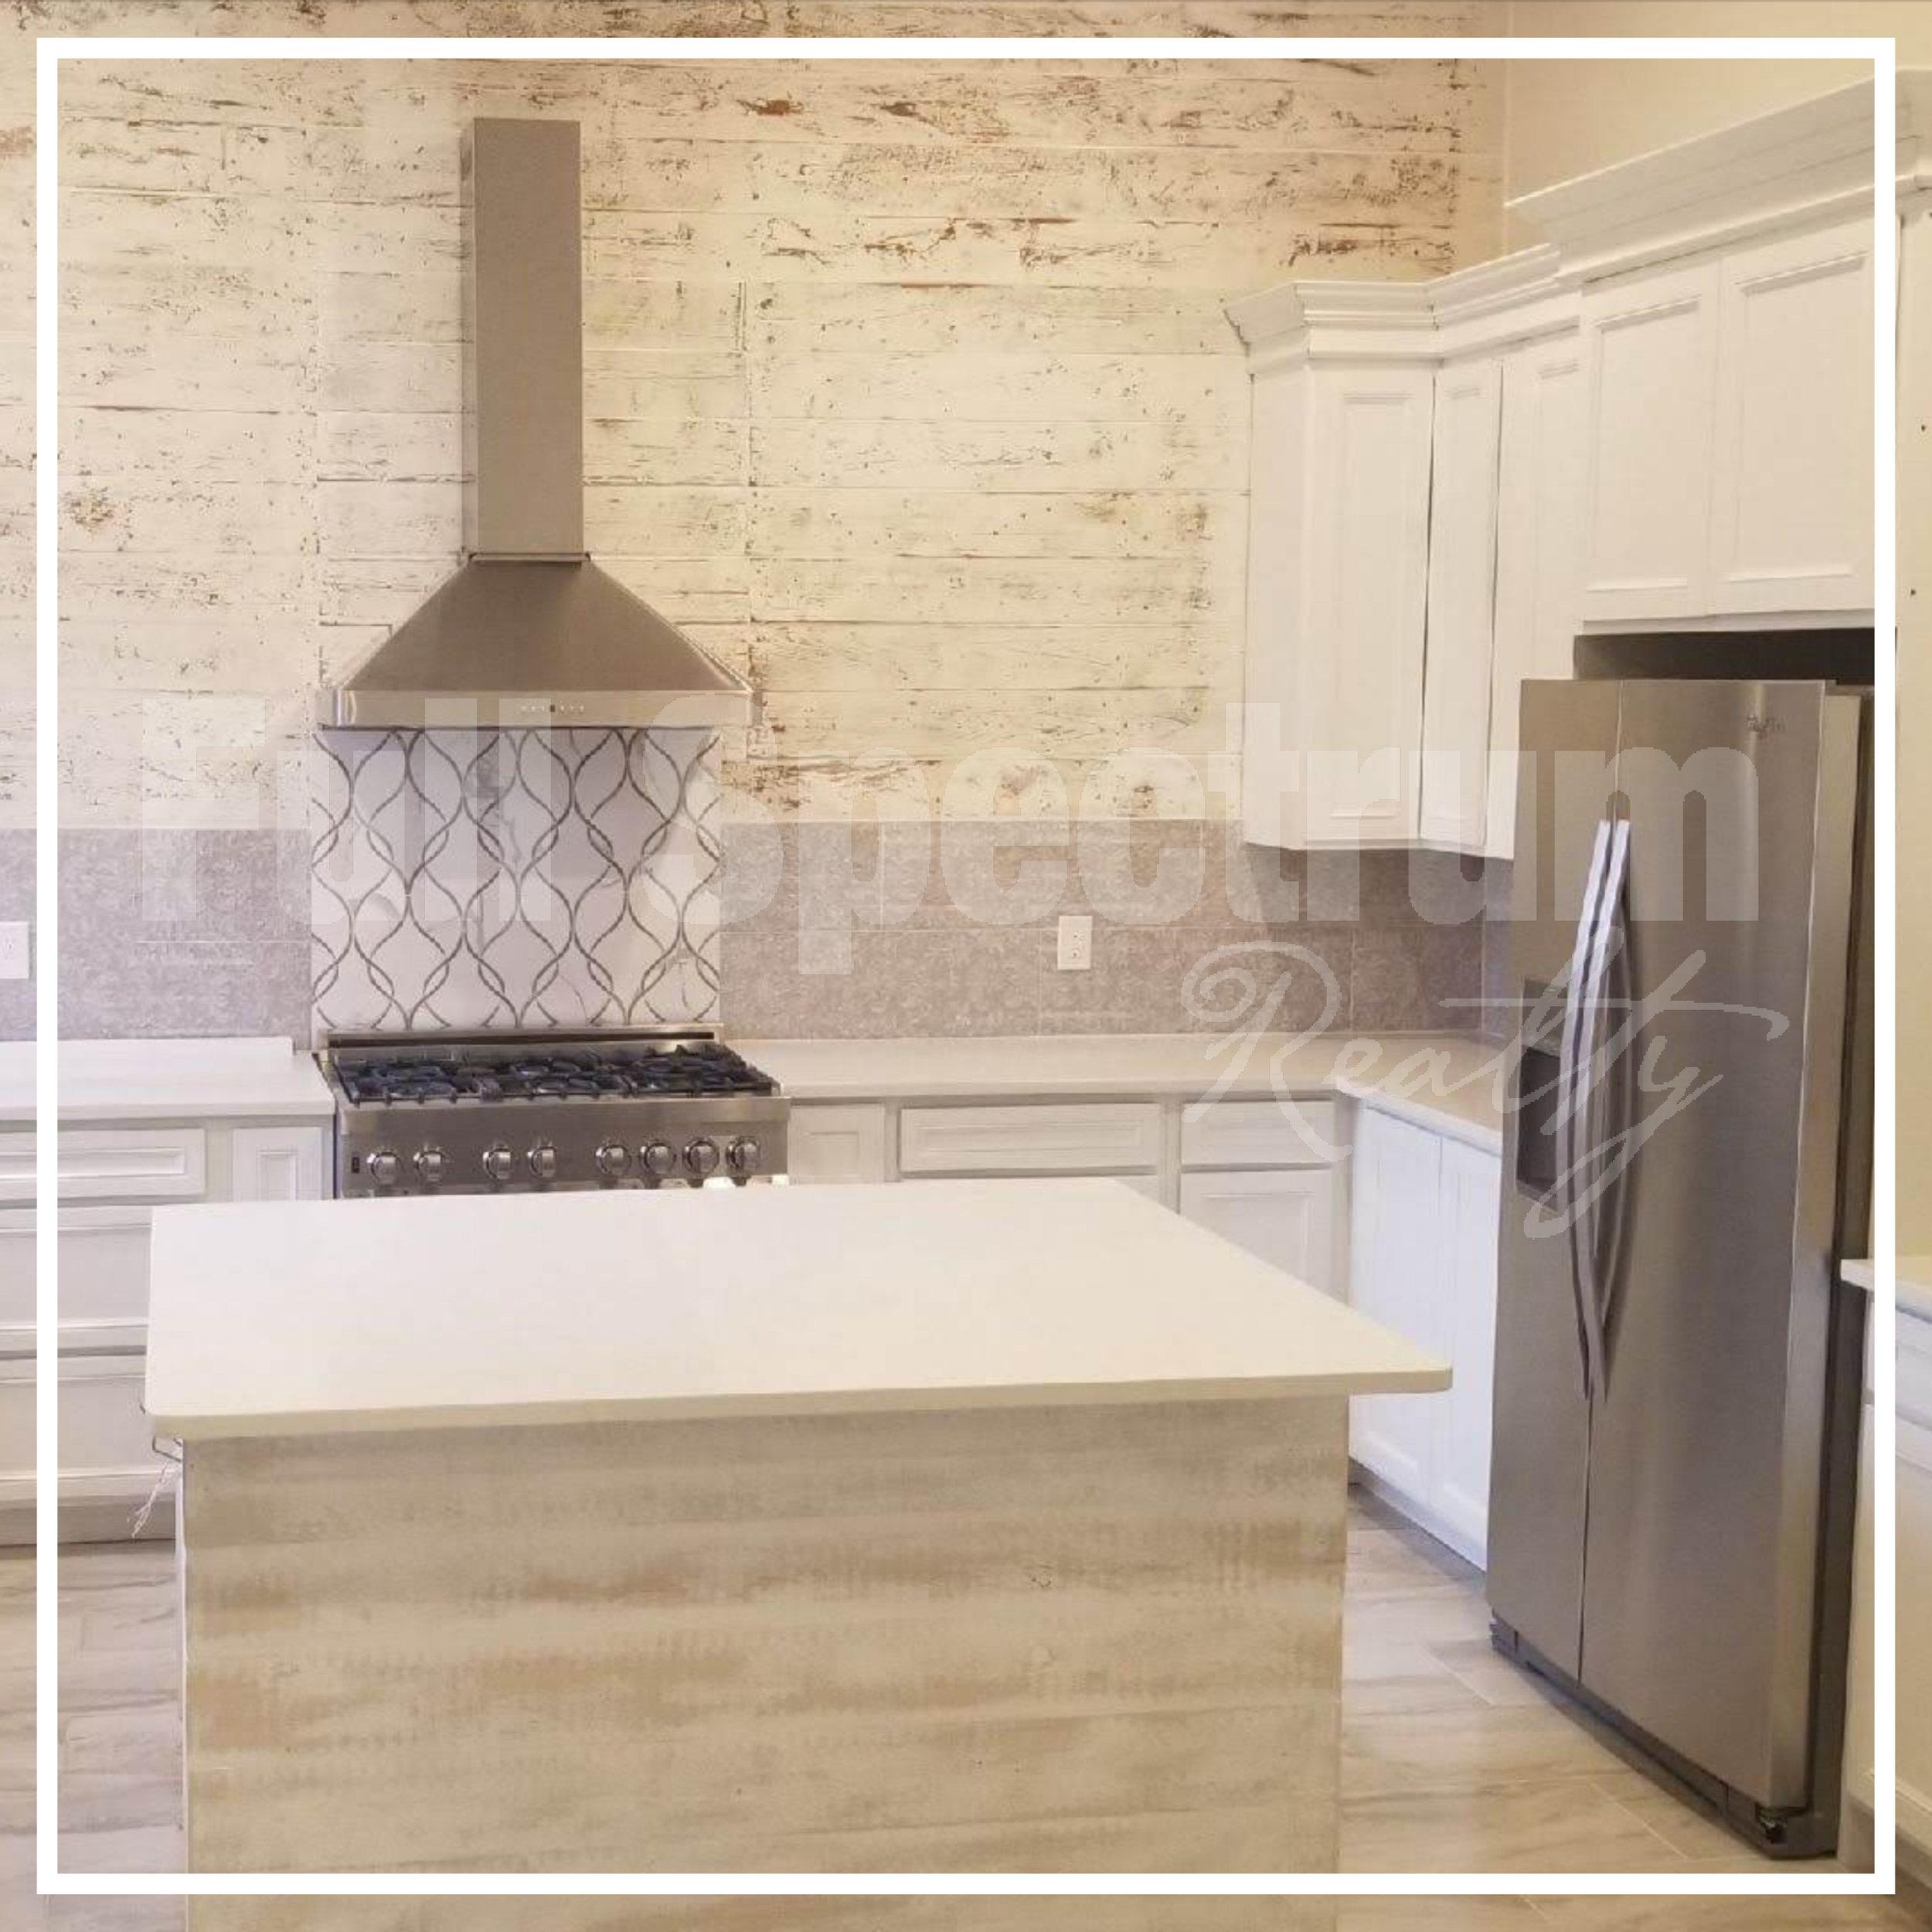 kitchen cabinet and backsplash install.jpg